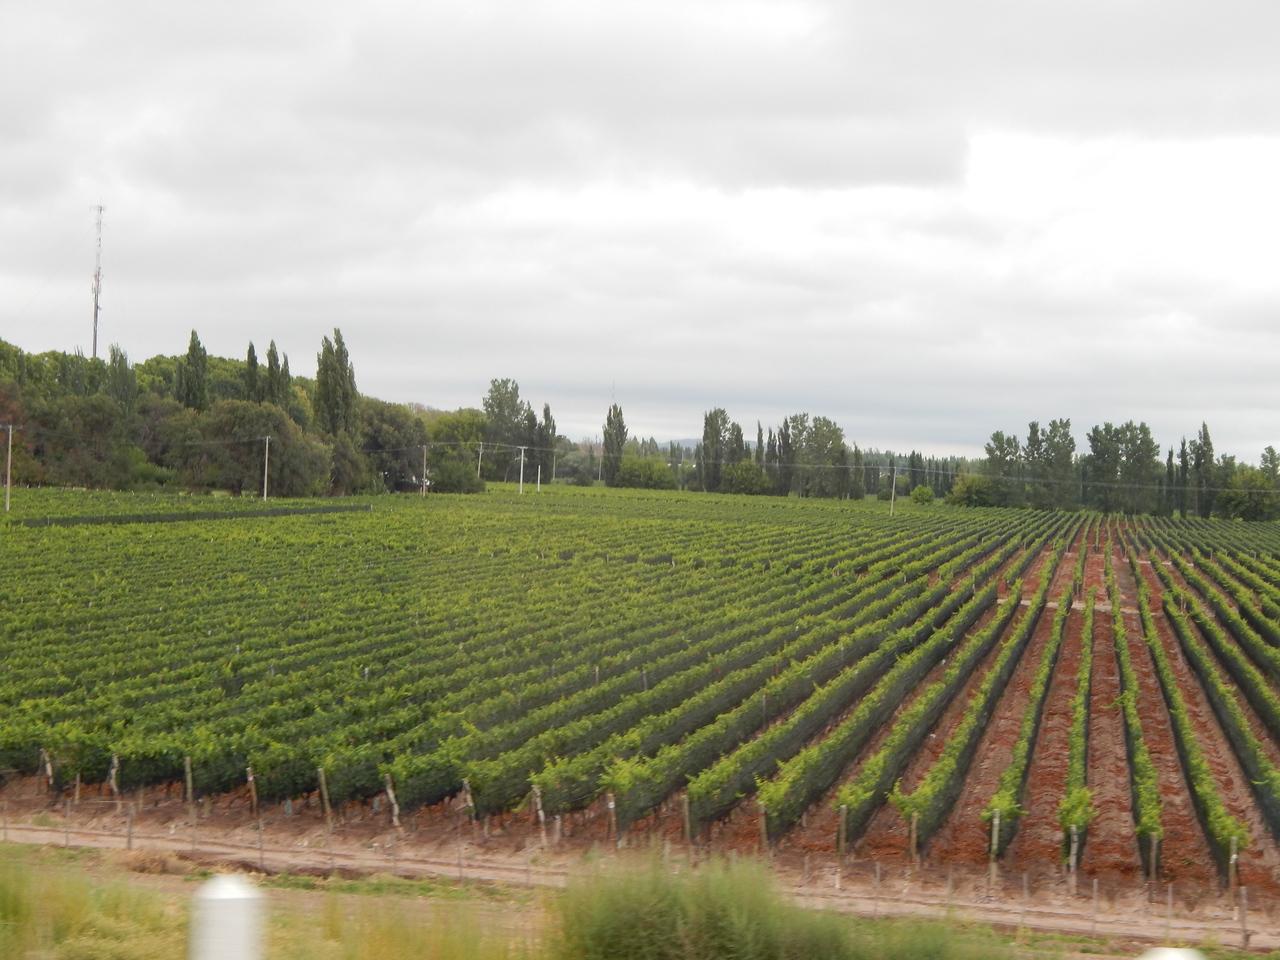 Vineyards are everywhere.